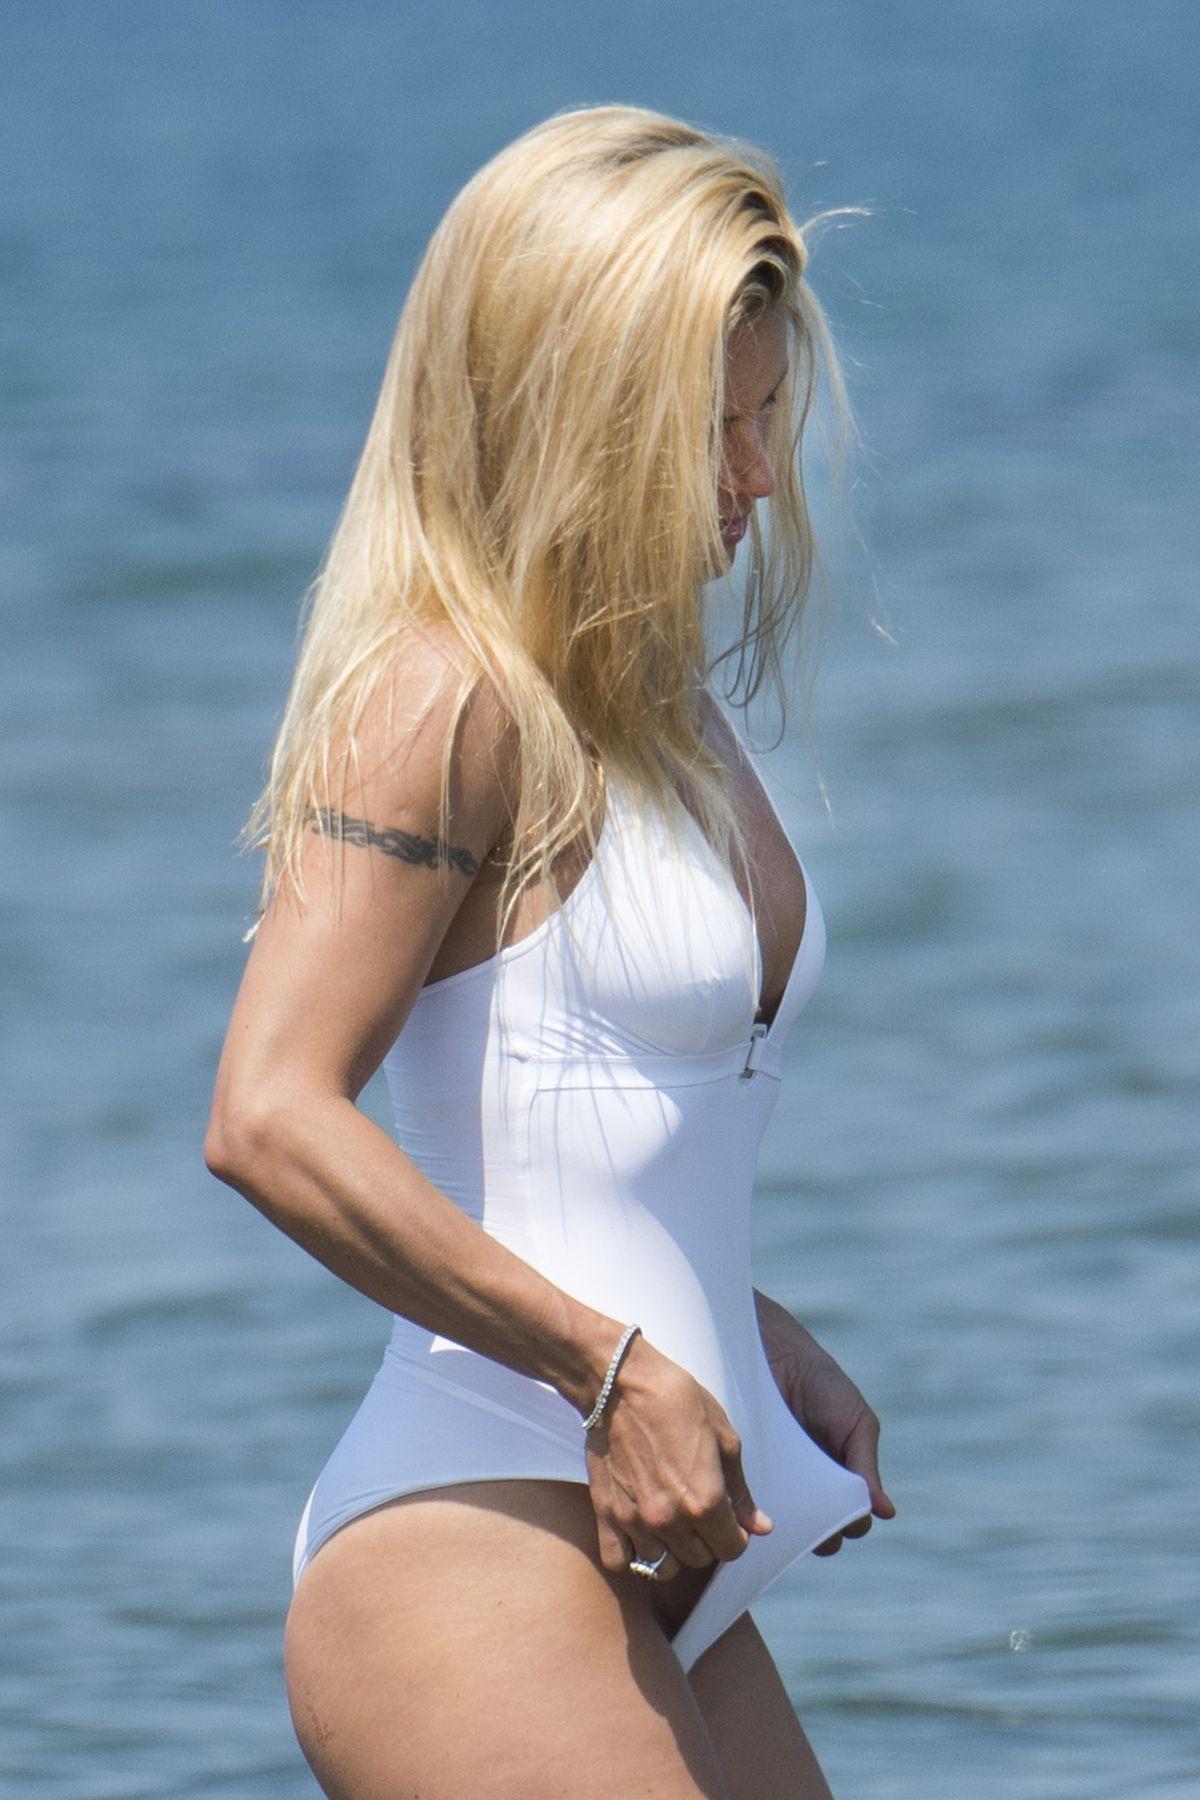 MICHELLE HUNZIKER in Swimsuit and Bikini at a Beach at Forte Dei Marmi